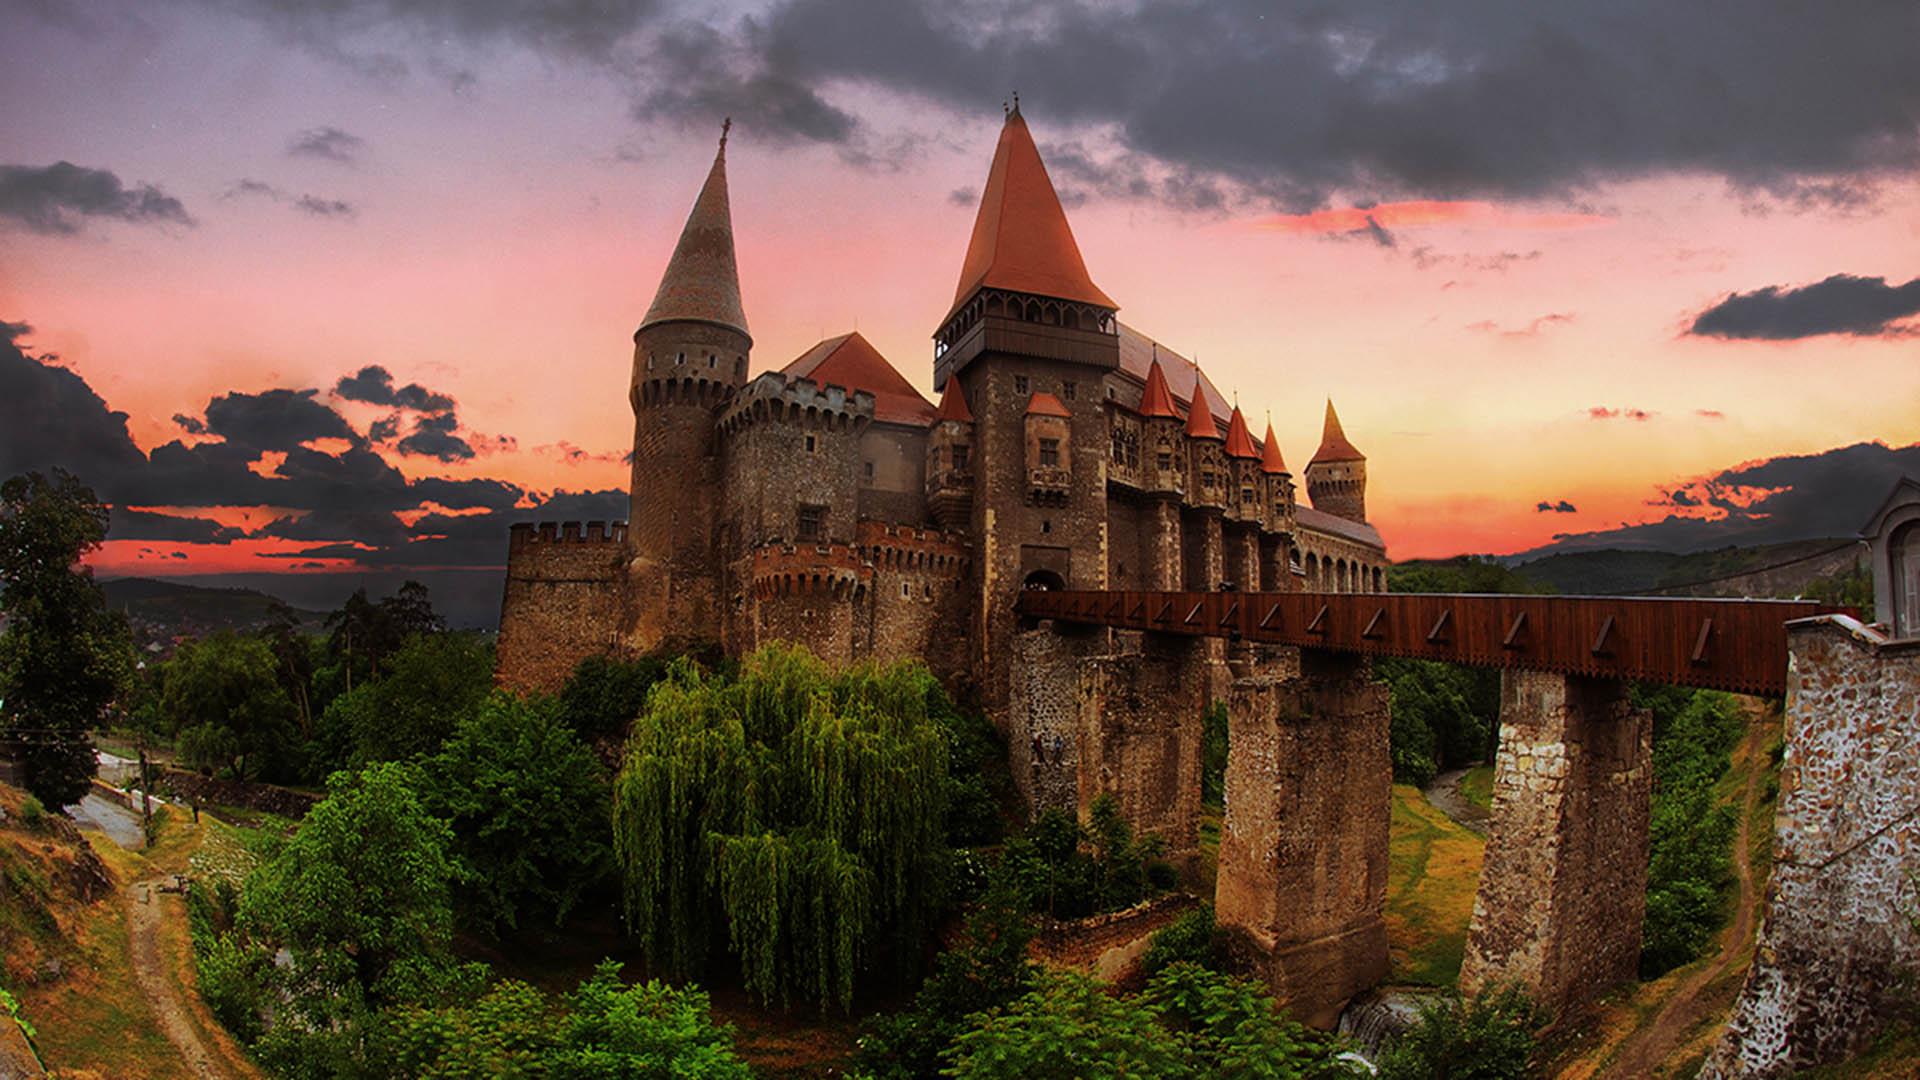 castelul din hunedoara background